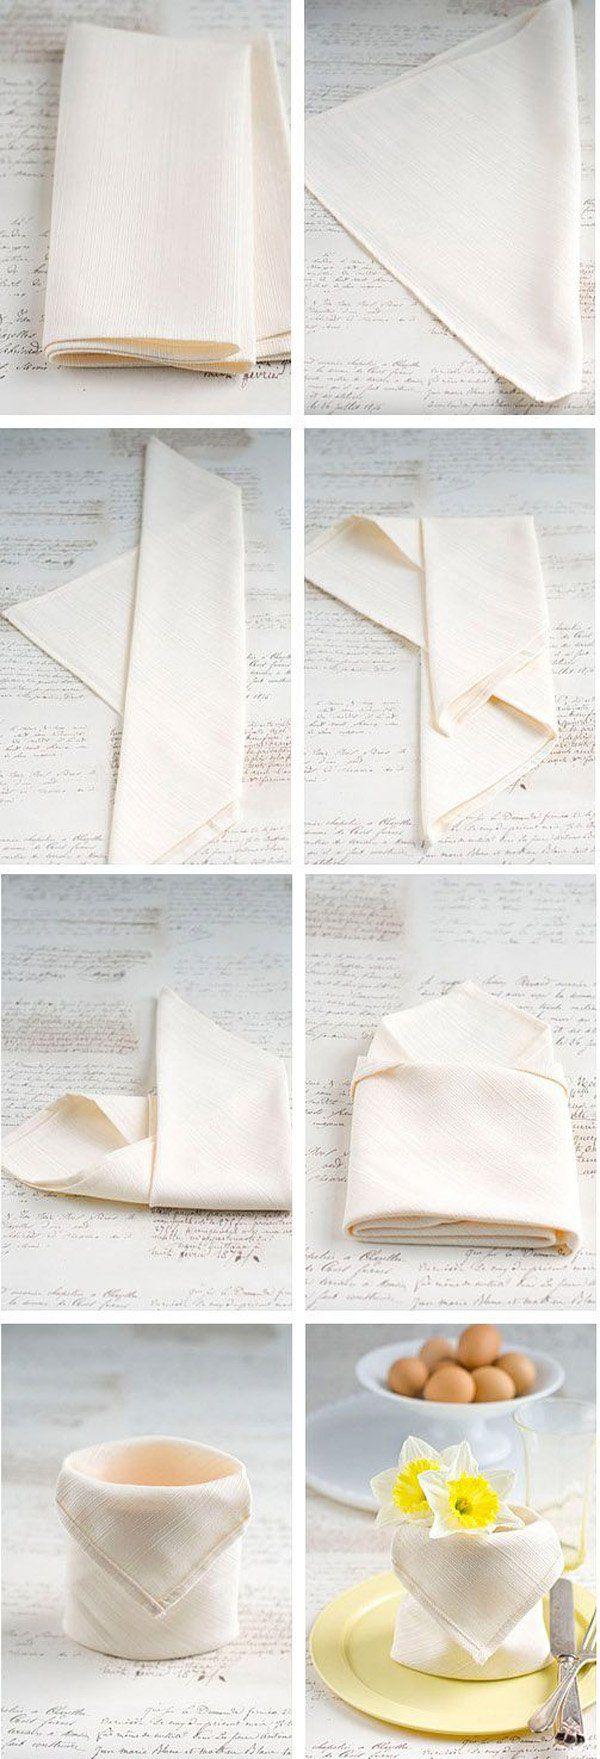 35 Beautiful Examples of Napkin Folding  <3 <3